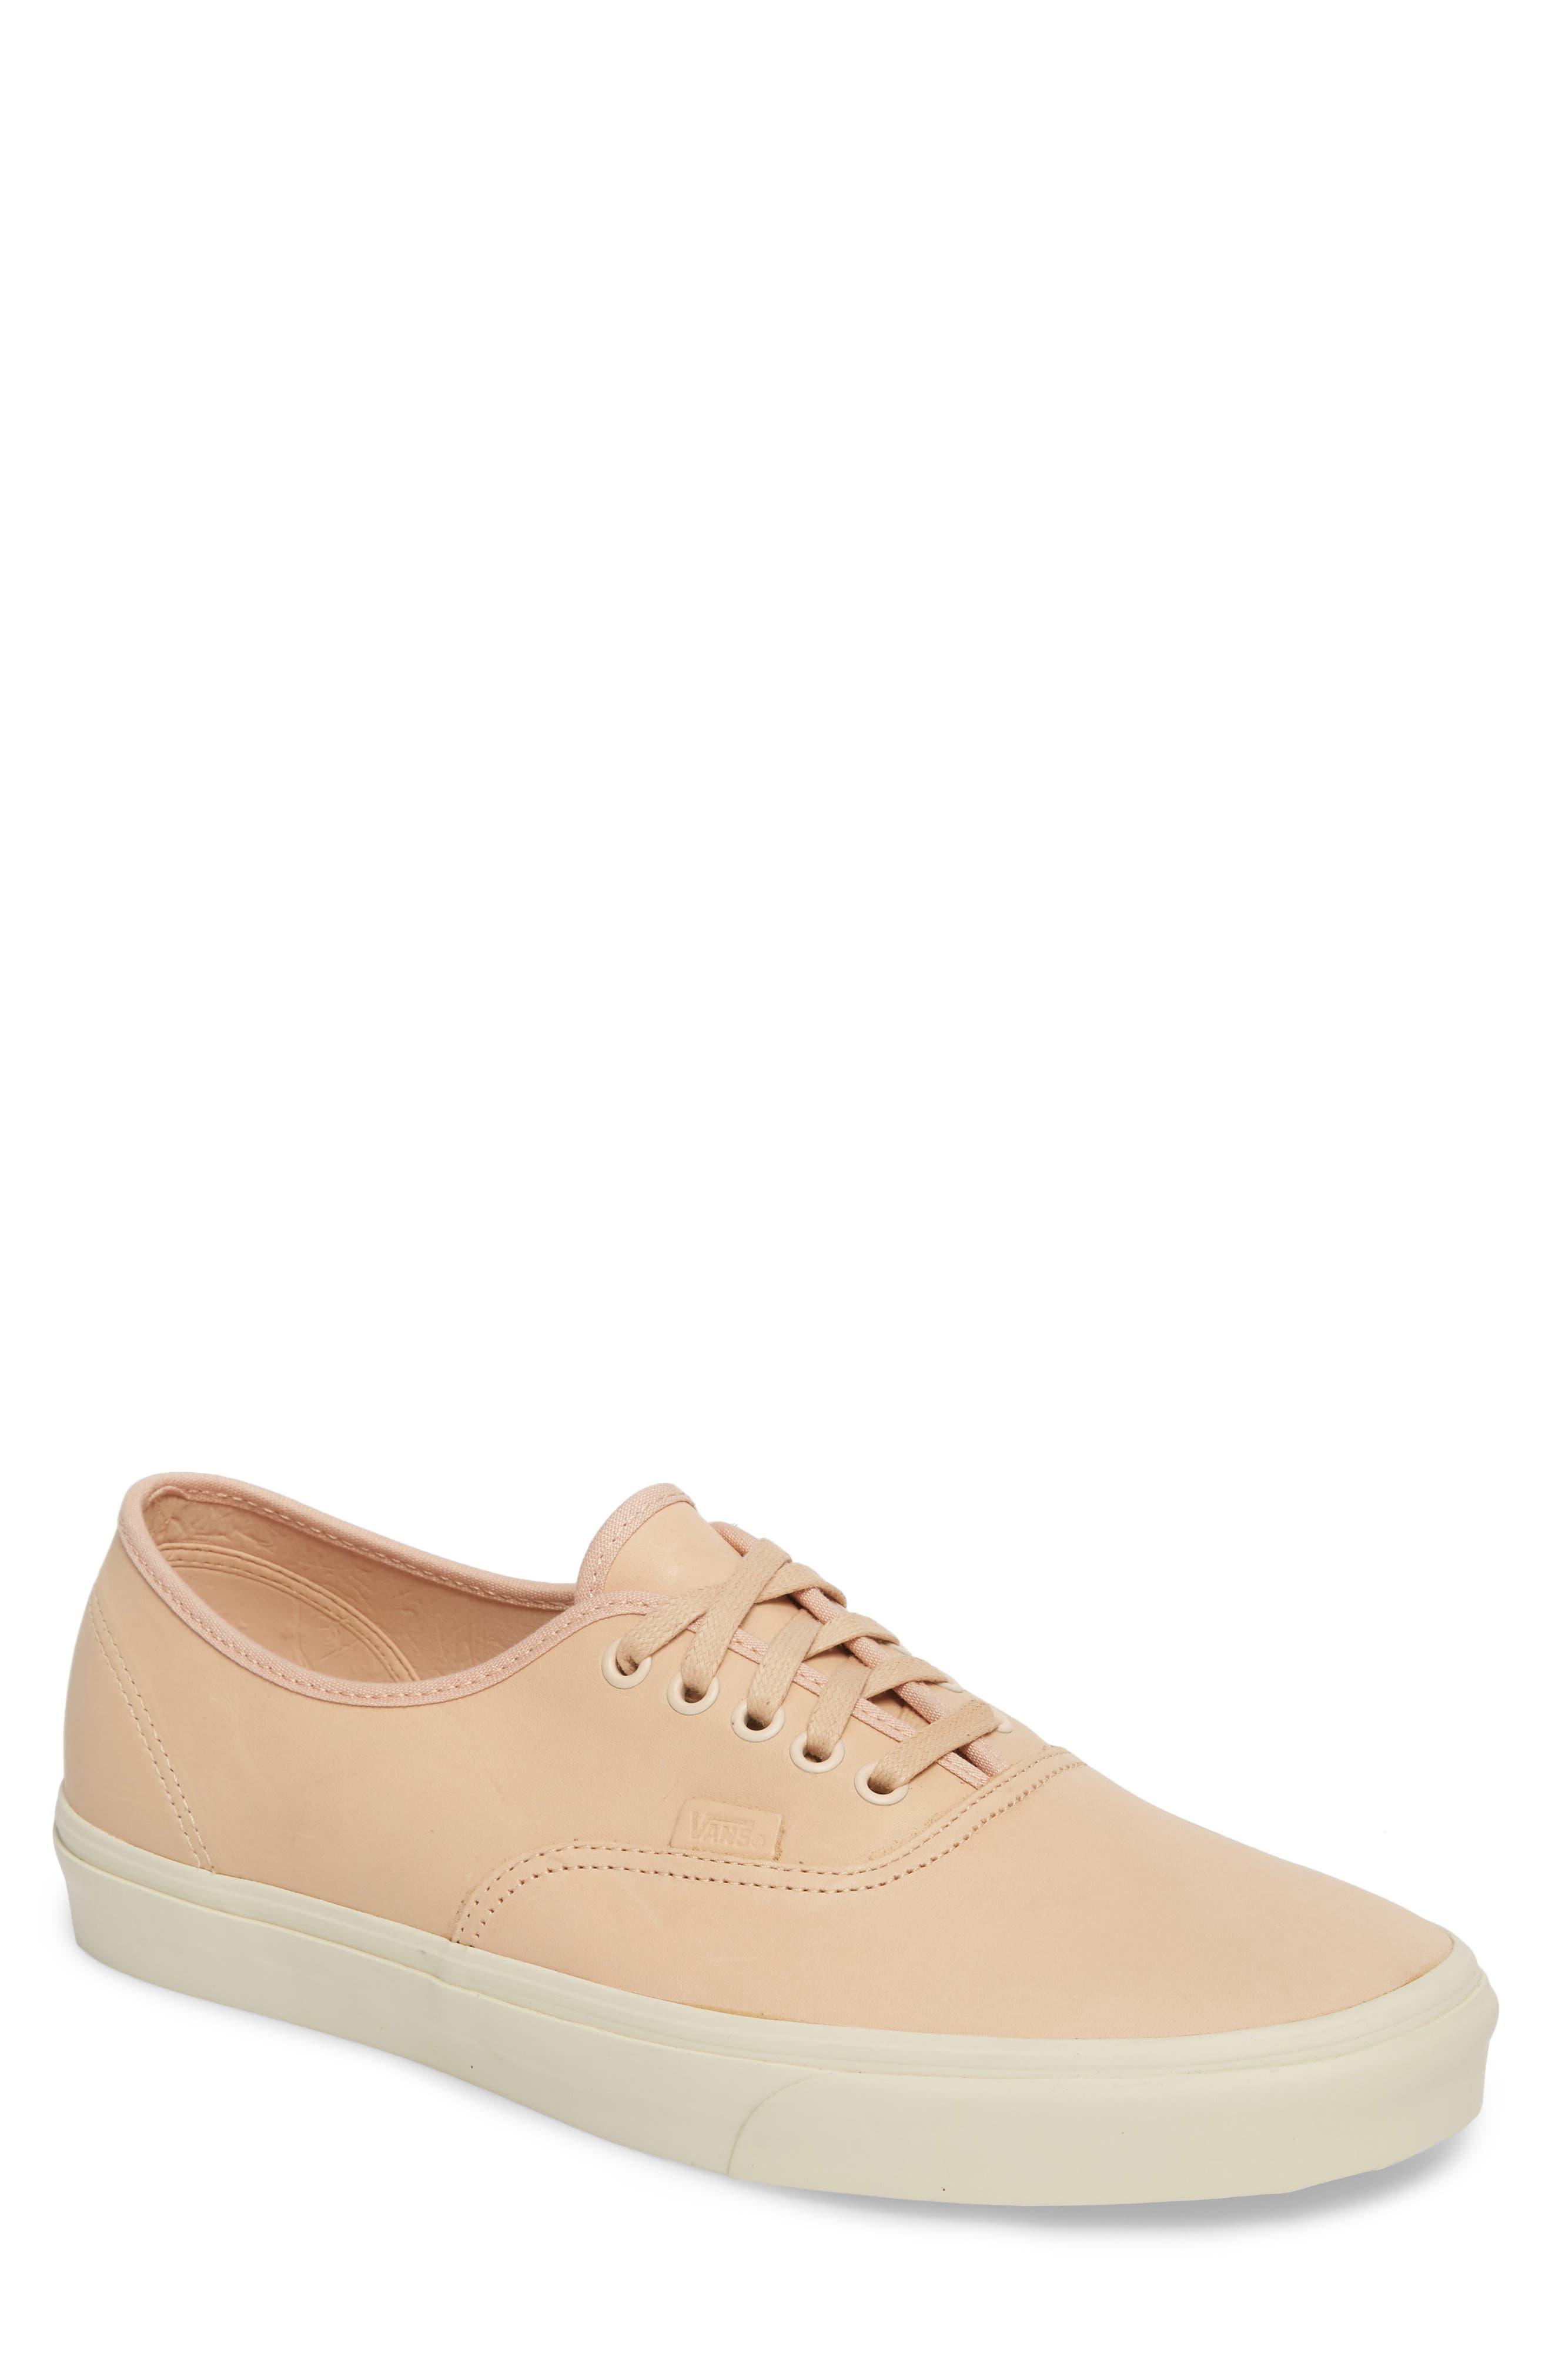 Authentic DX Sneaker,                         Main,                         color, Veggie Tan Leather